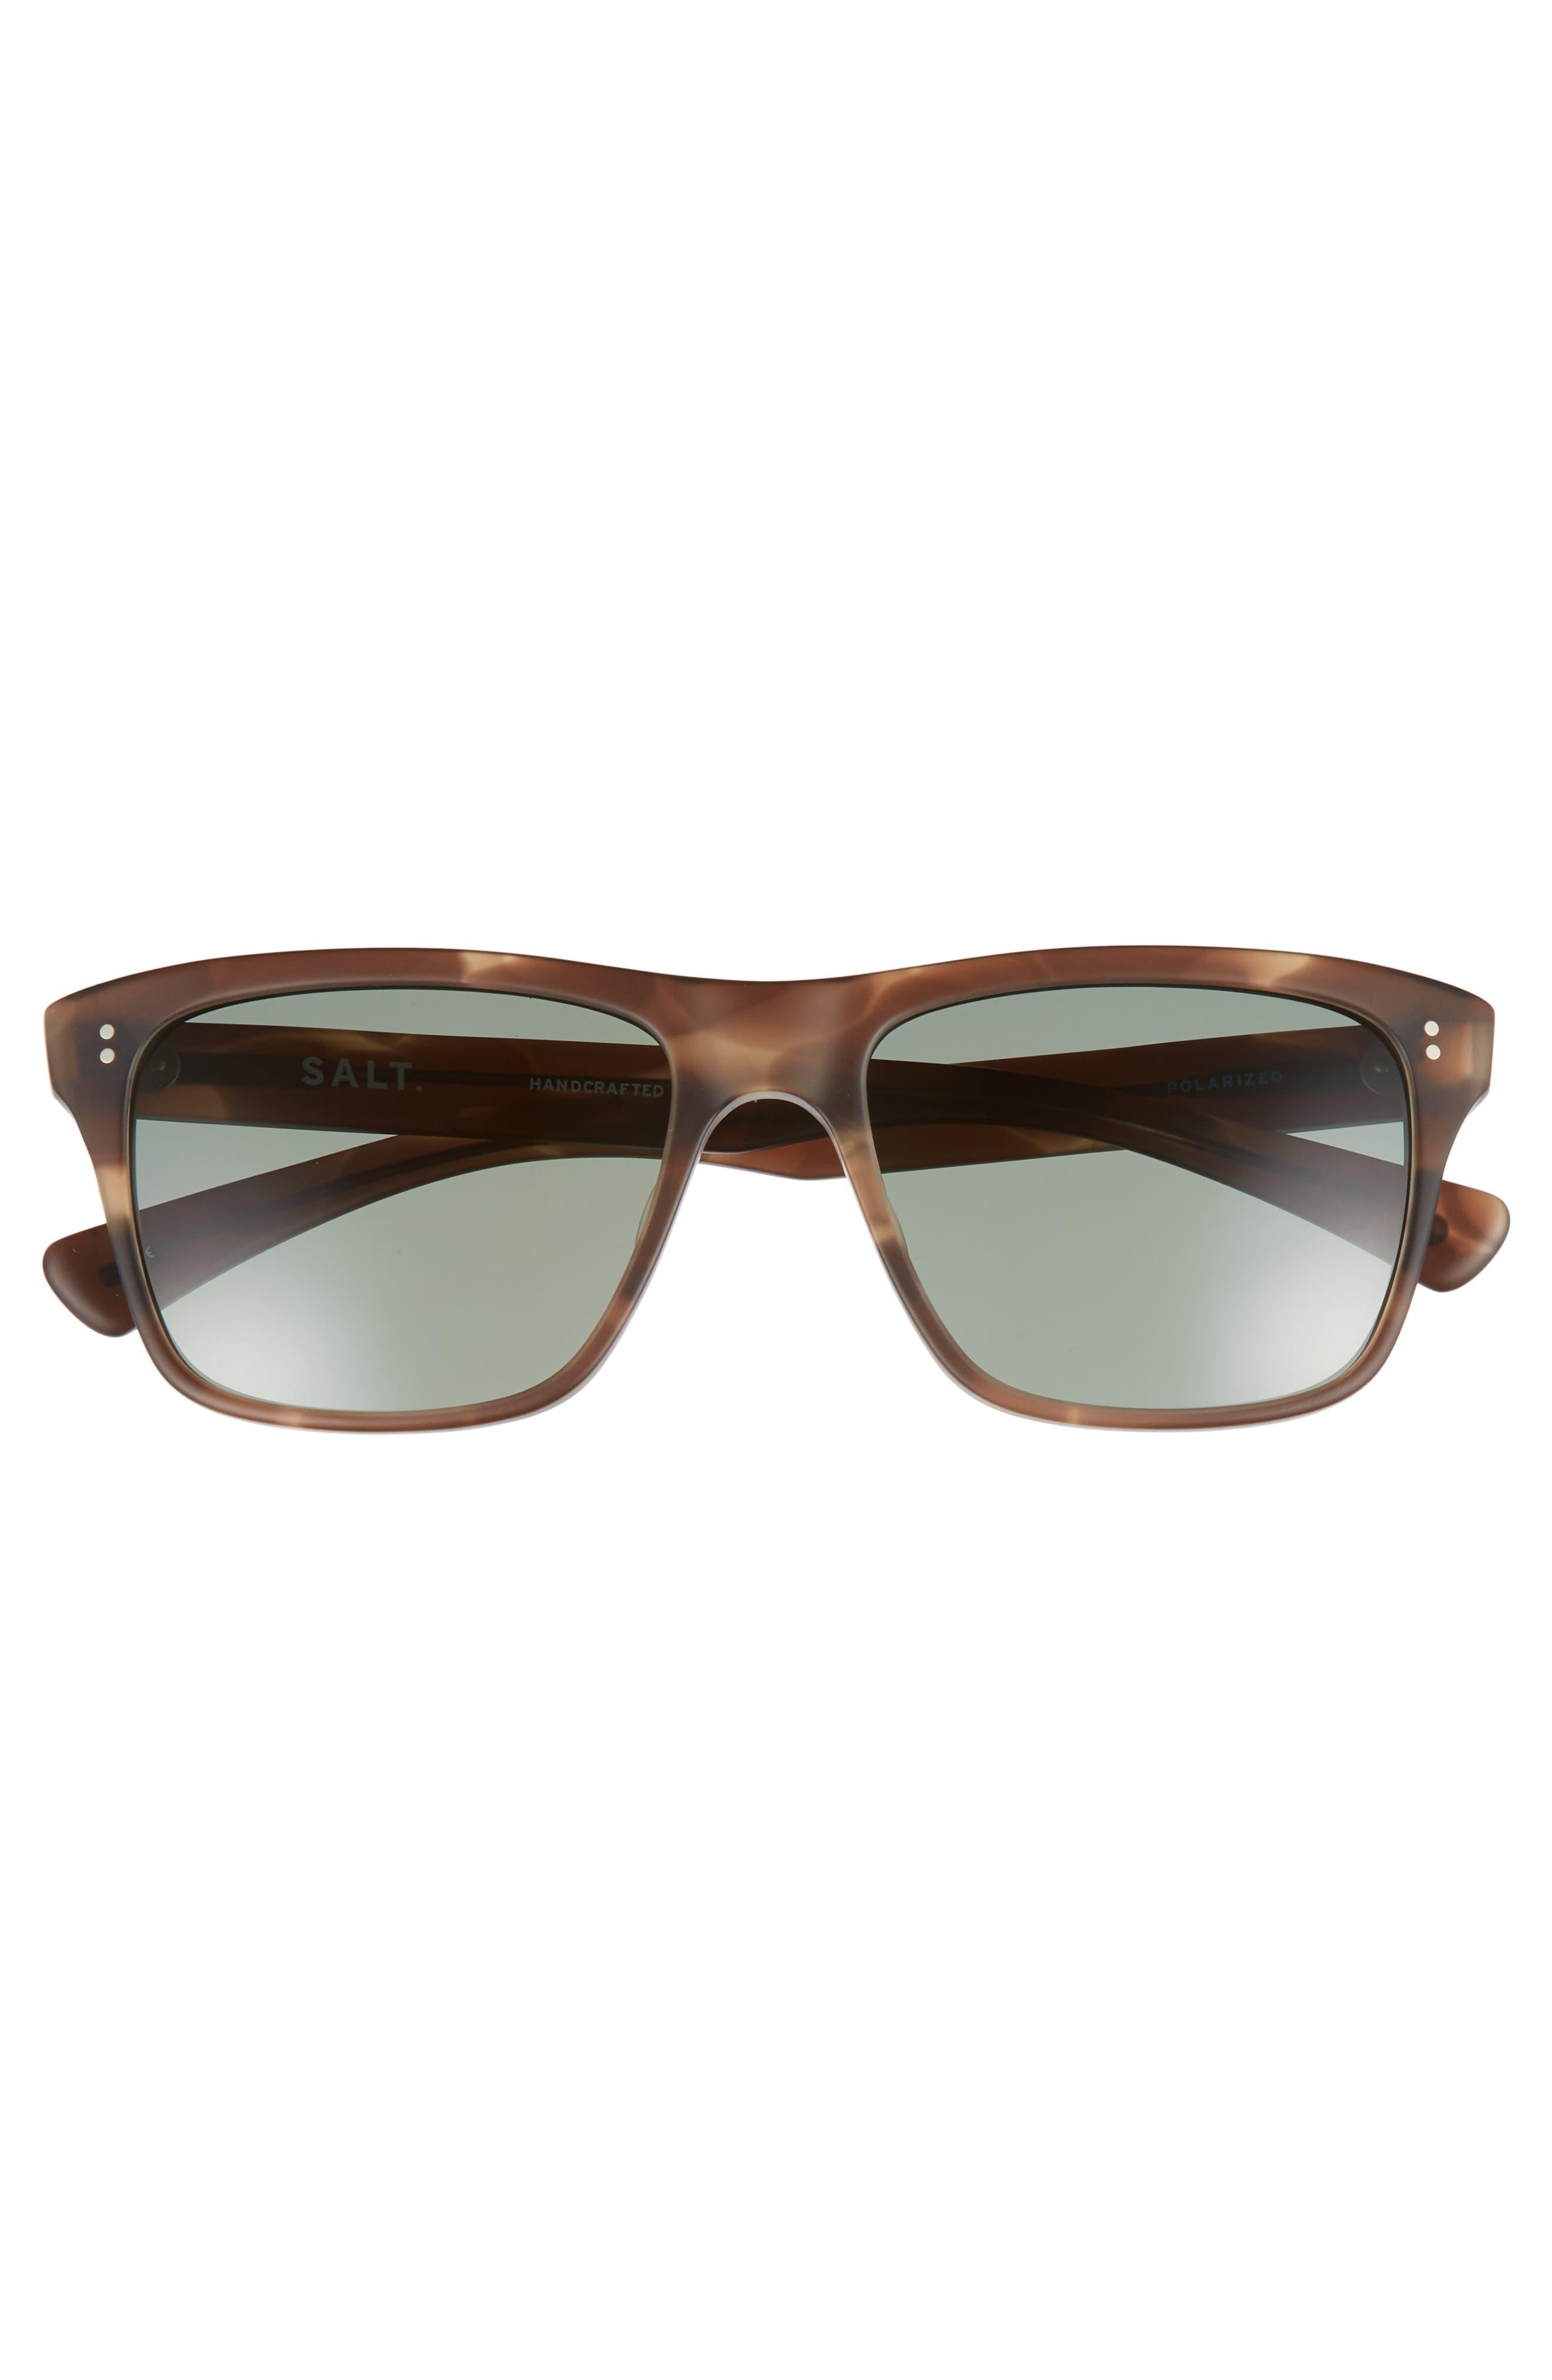 41b2152bcb1a Men s SALT. Sunglasses   Eyeglasses